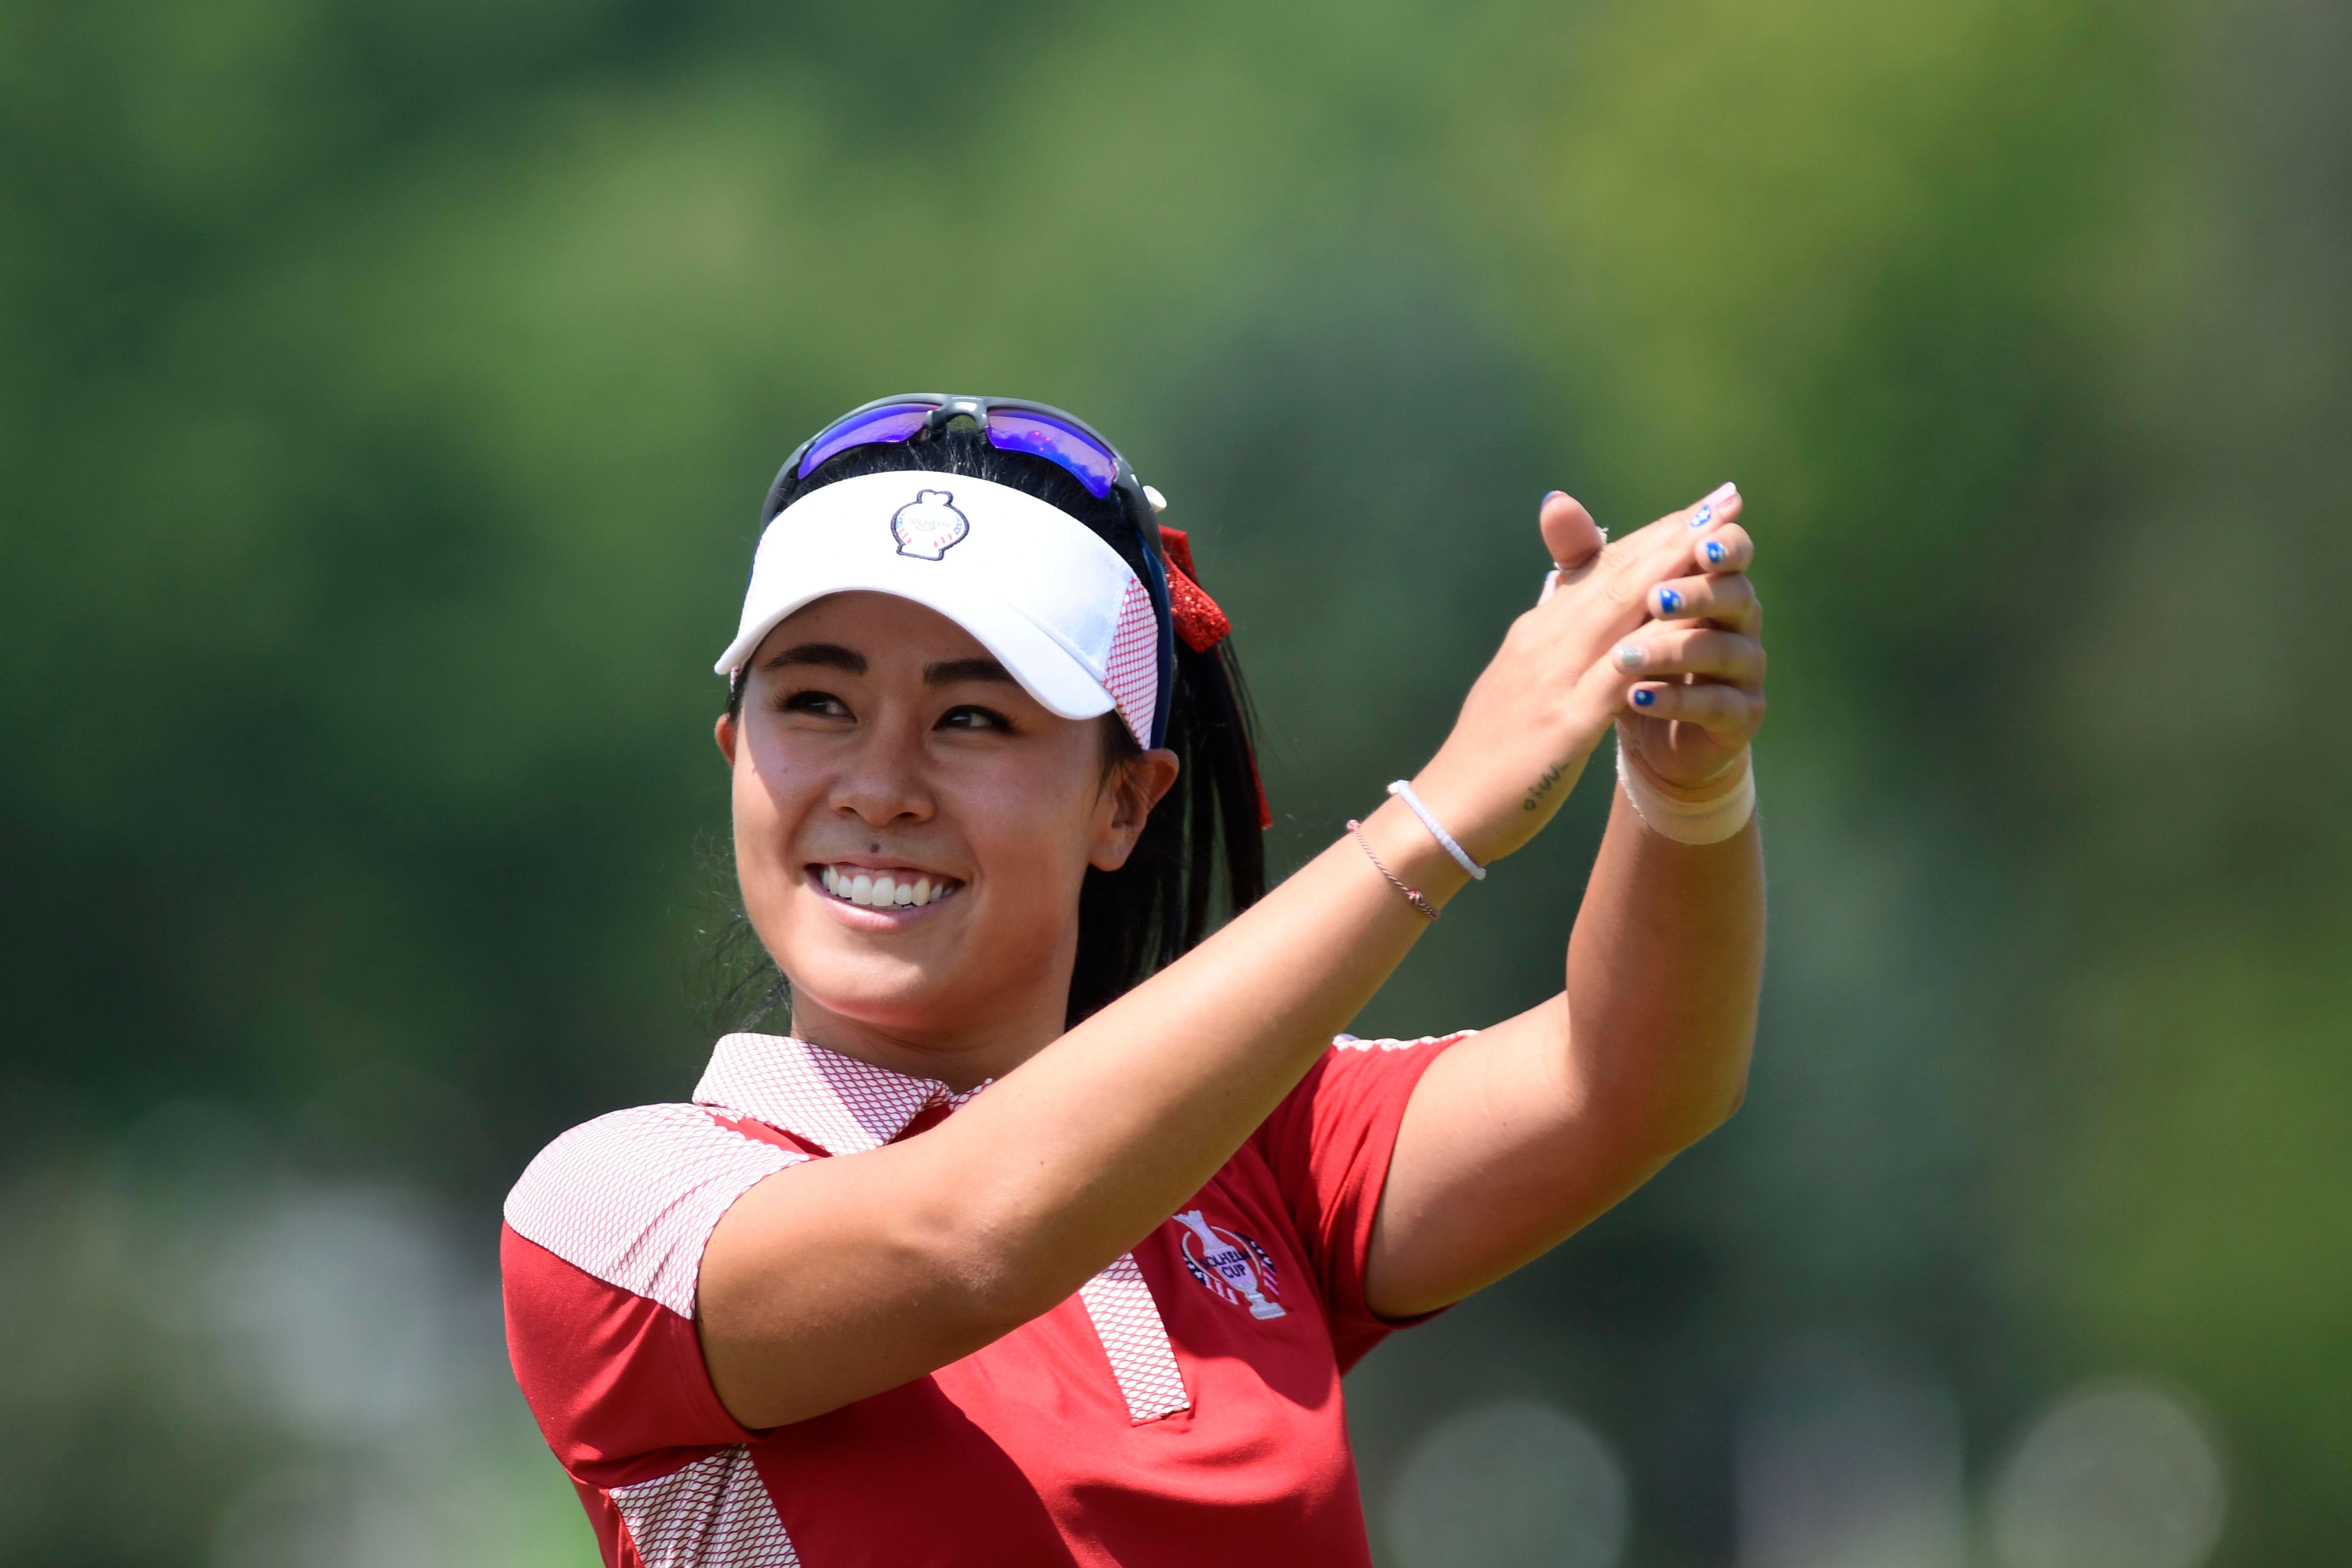 636386944488160571-USATSI-10225509 Solheim Cup: Danielle Kang becomes new U.S. star